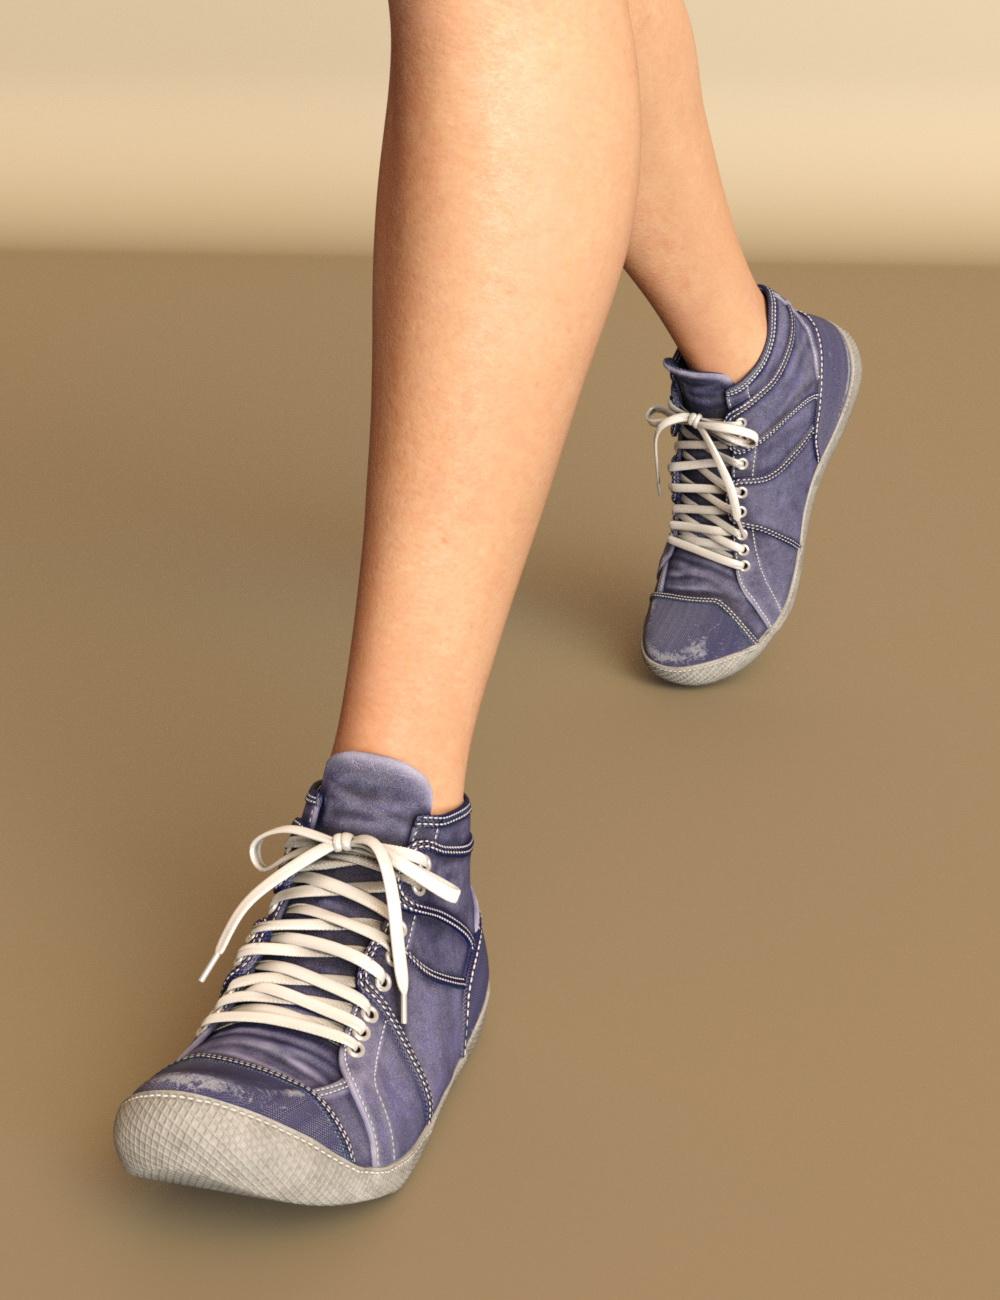 JooJoo Sneakers for Genesis 8 Female(s) by: chungdan, 3D Models by Daz 3D